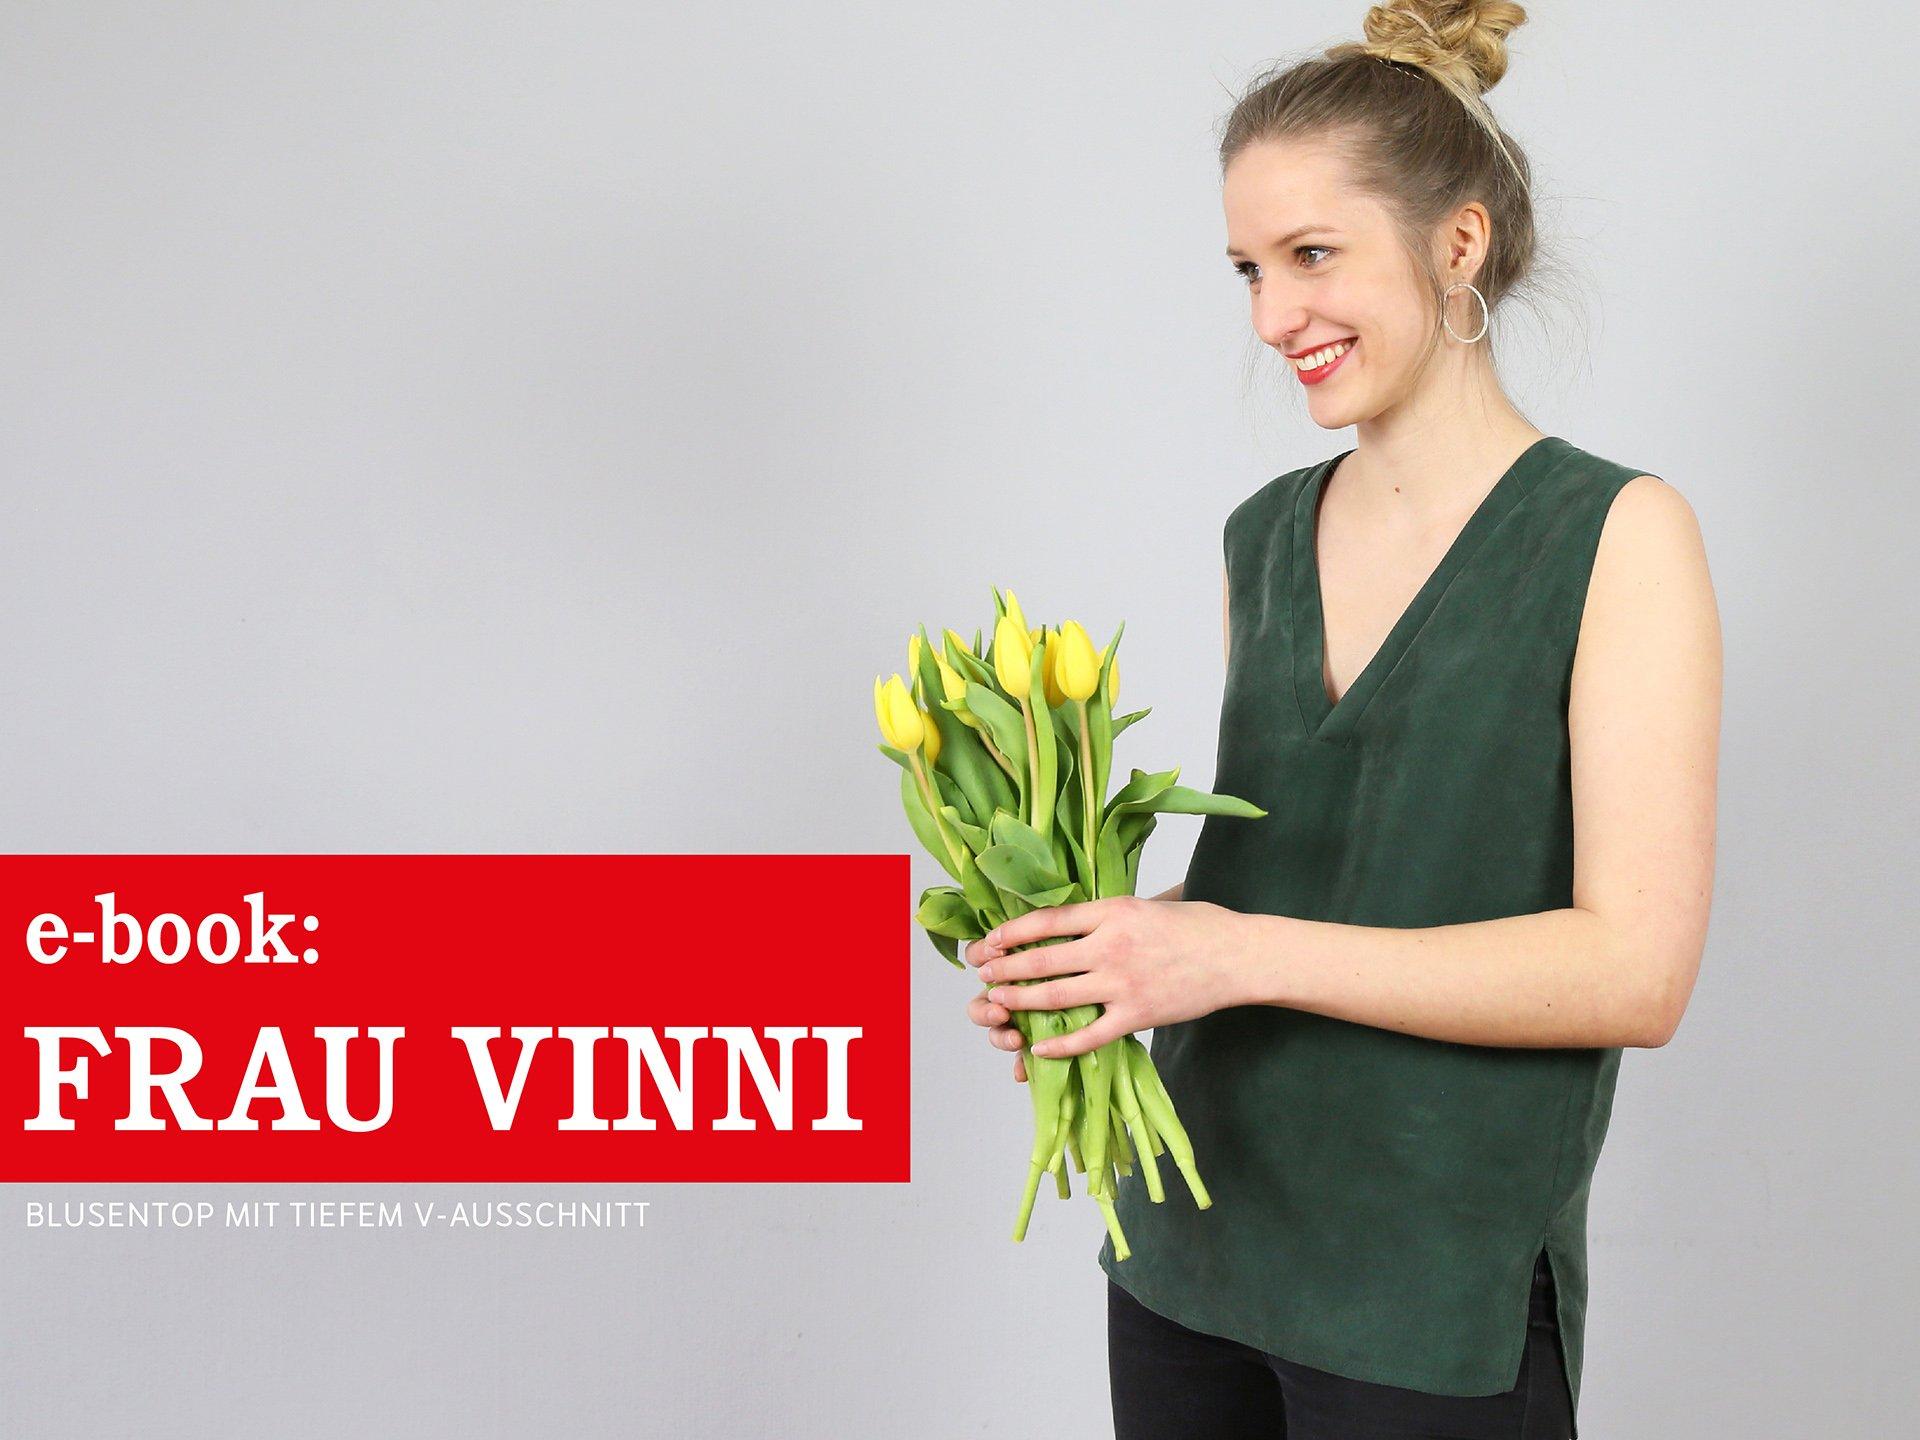 FRAU VINNI • Blusentop, e-book